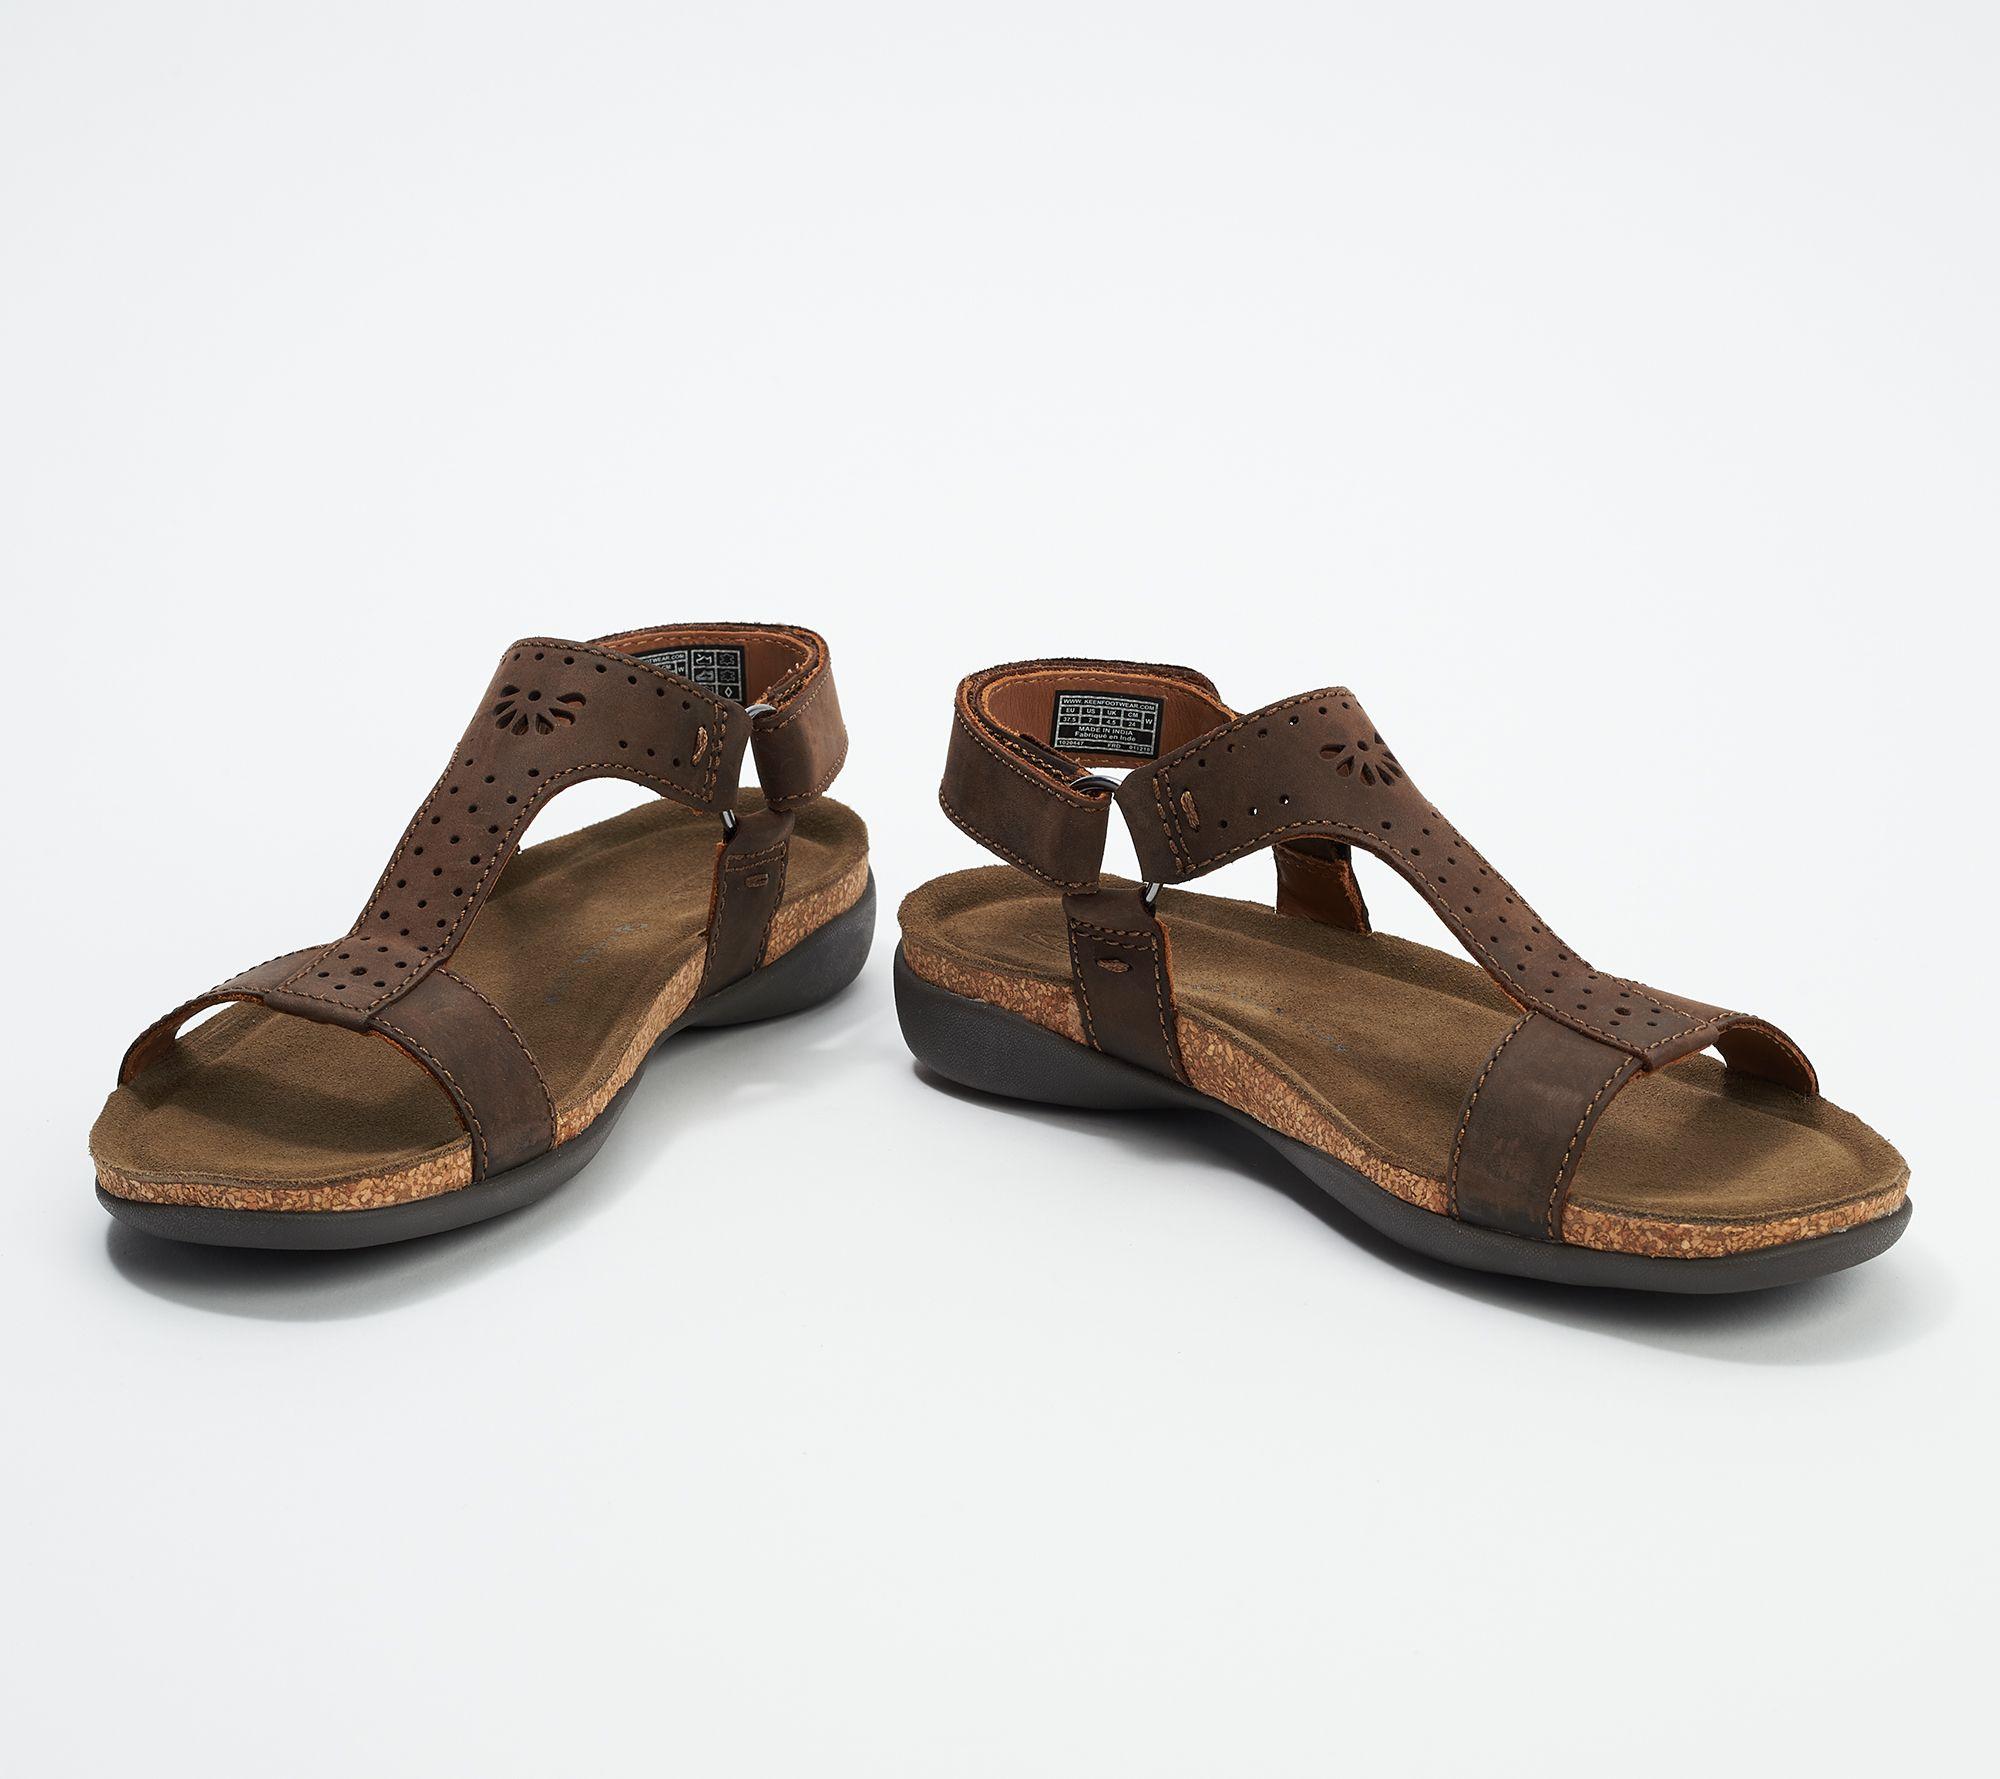 7ae19e82e39 KEEN Leather T-Strap Sandals - Kaci Ana — QVC.com